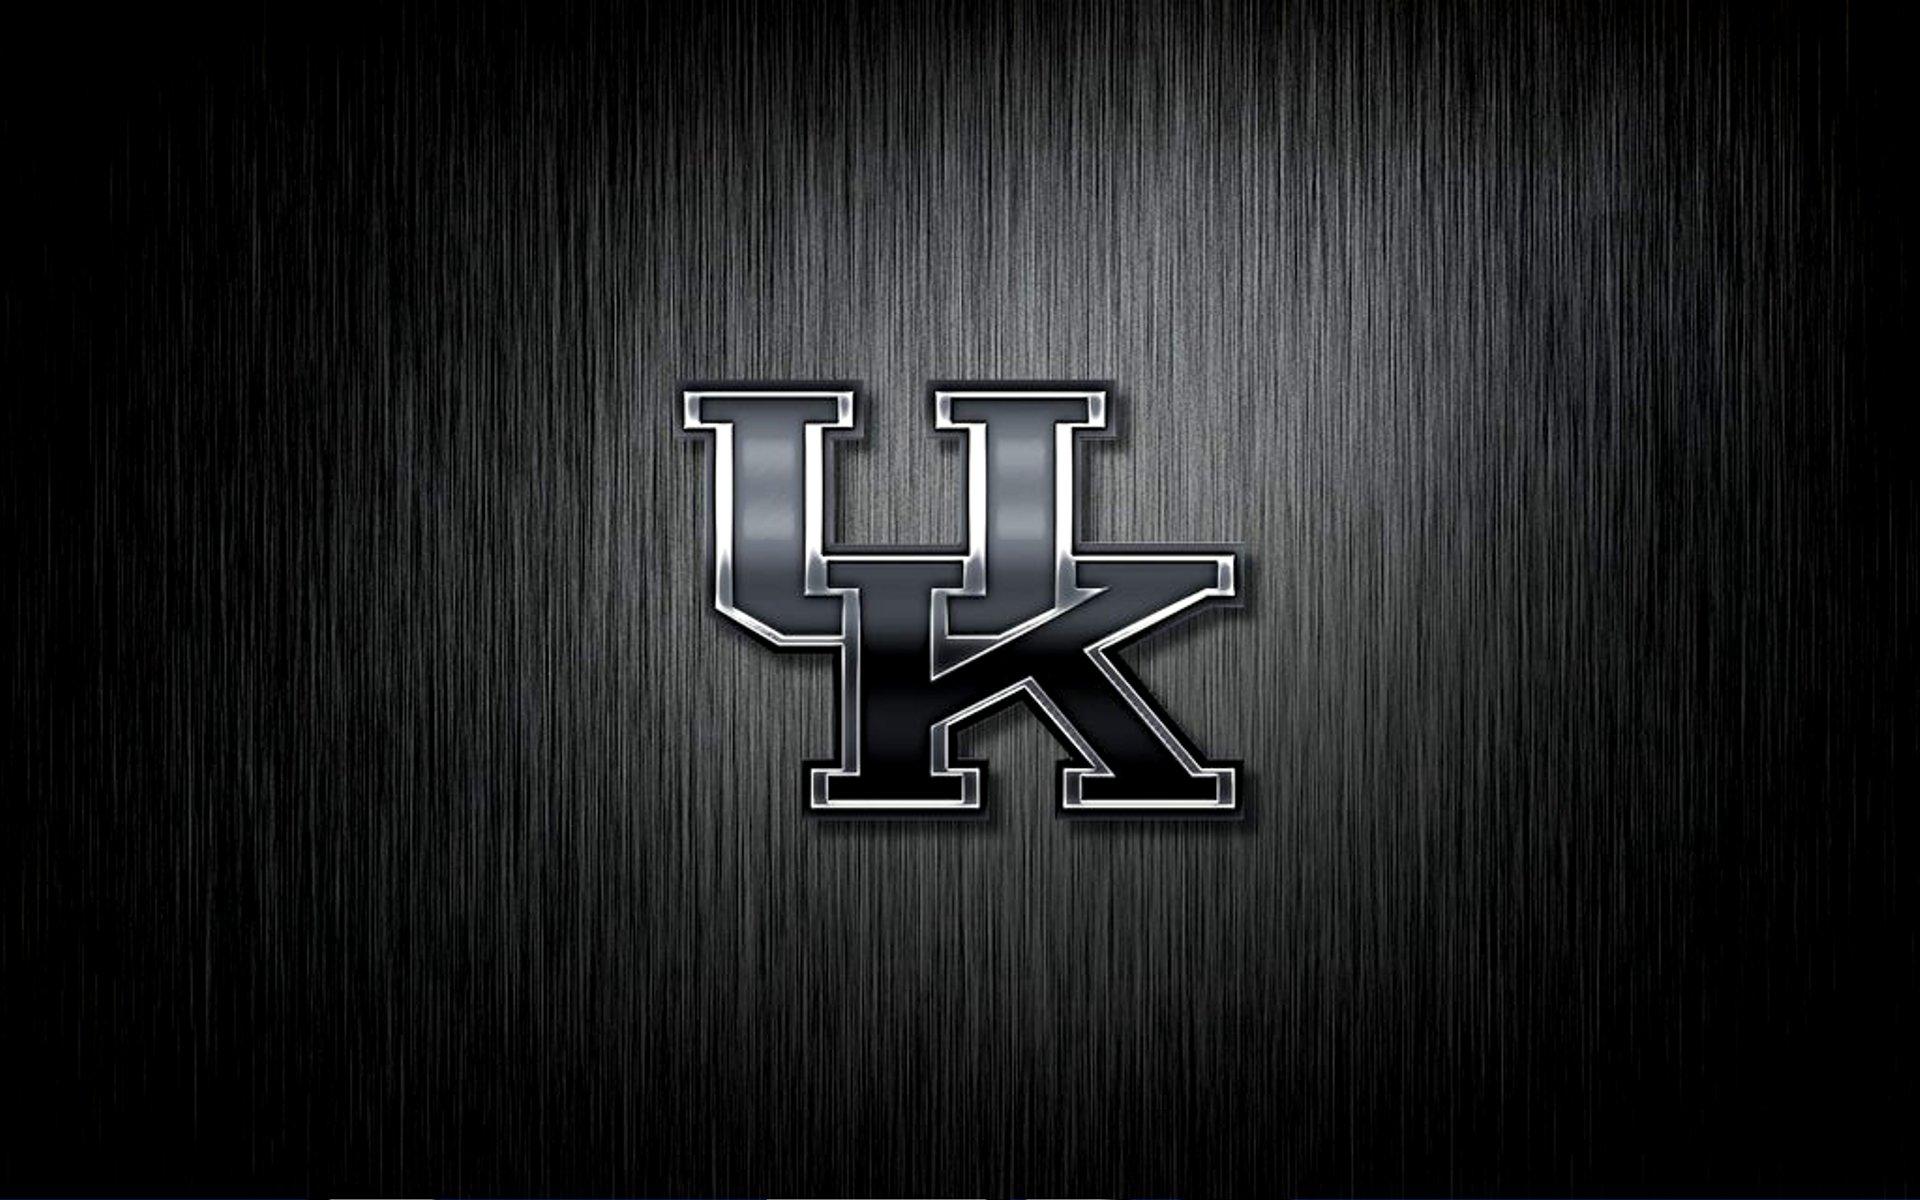 Uk Basketball: Kentucky Basketball Wallpapers (47 Wallpapers)